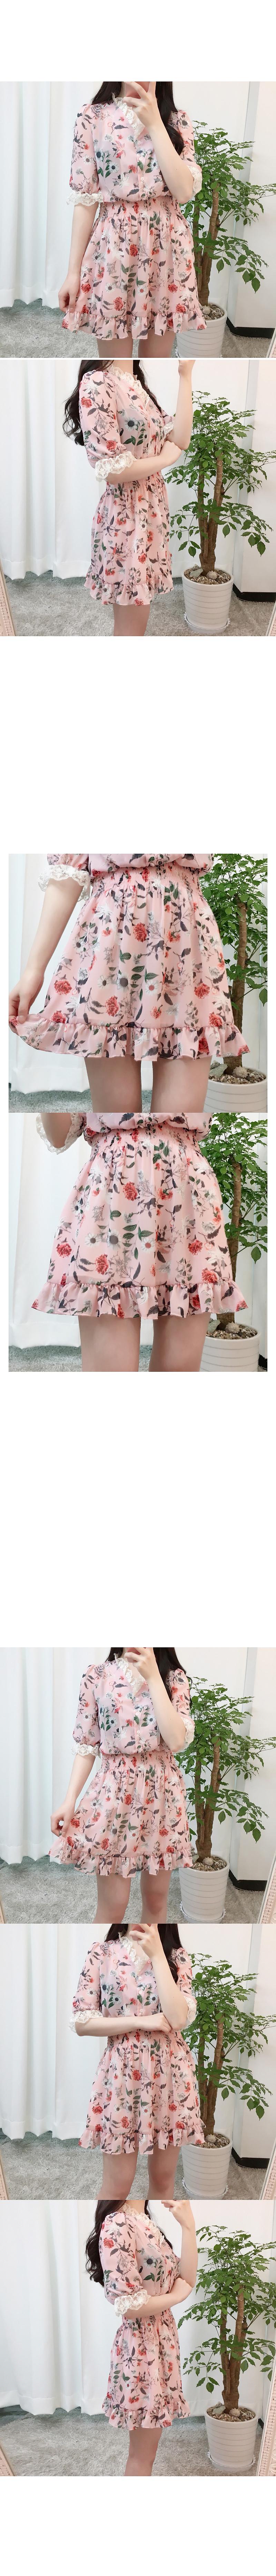 Smoke Flower Dress